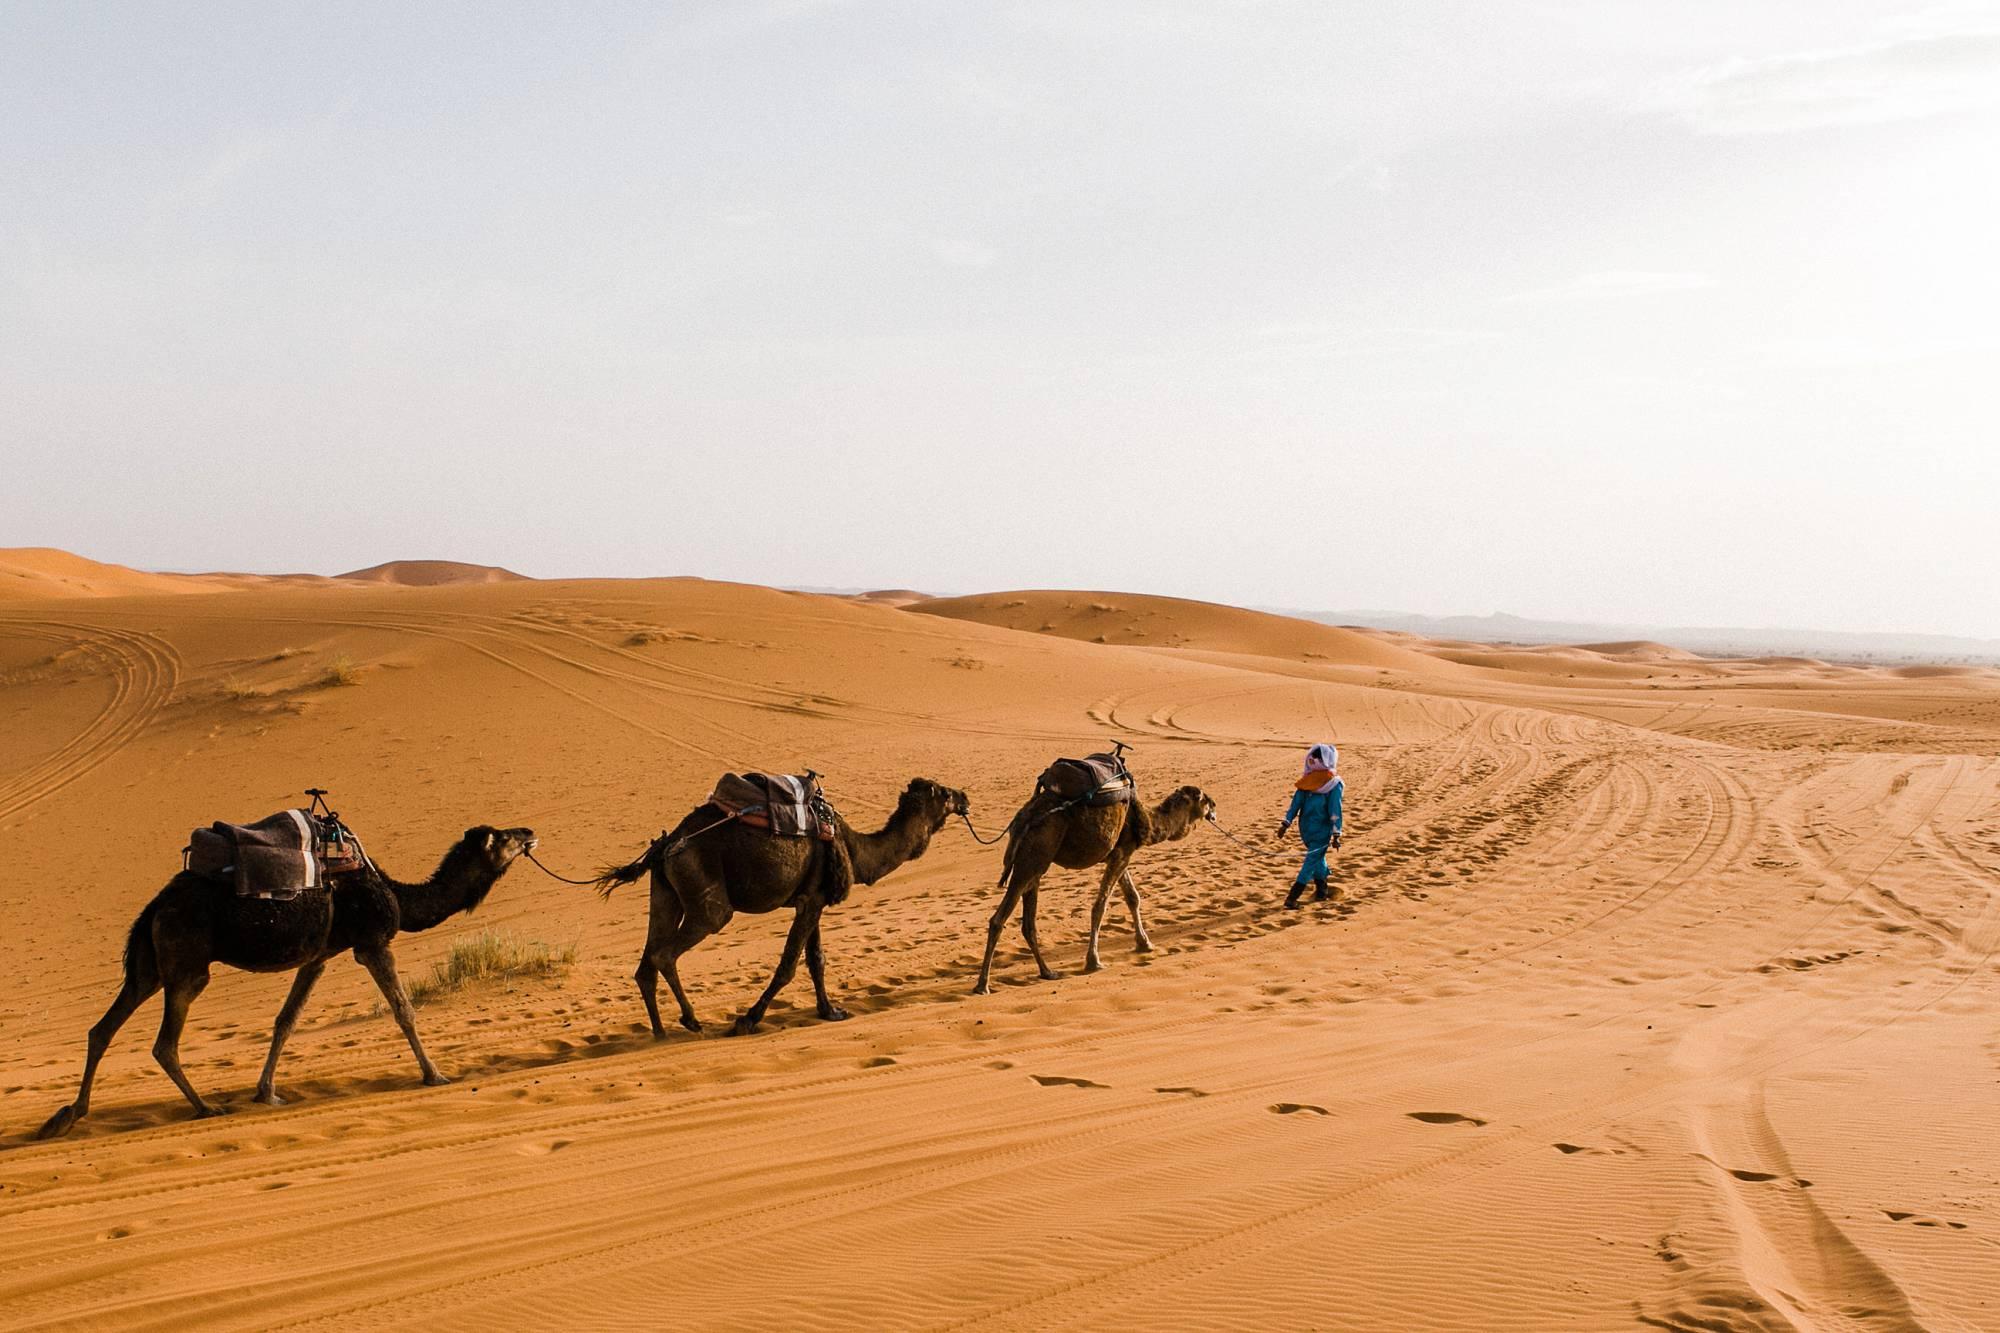 Camels Morocco Sahara